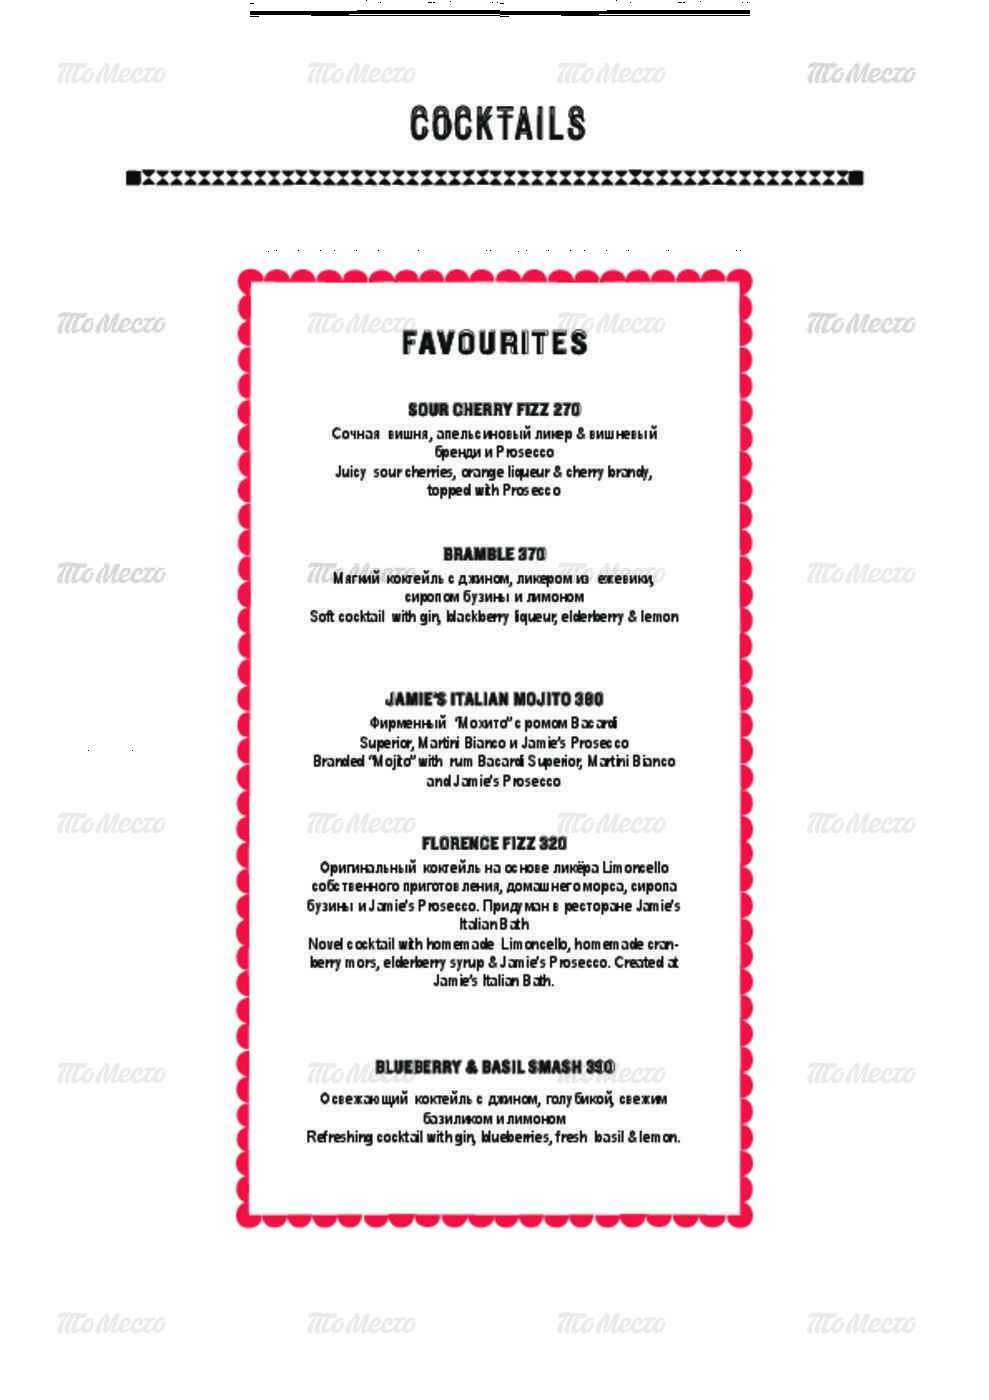 Меню ресторана Jamie's Italian (Джеймис Италиан) на Конюшенной площади